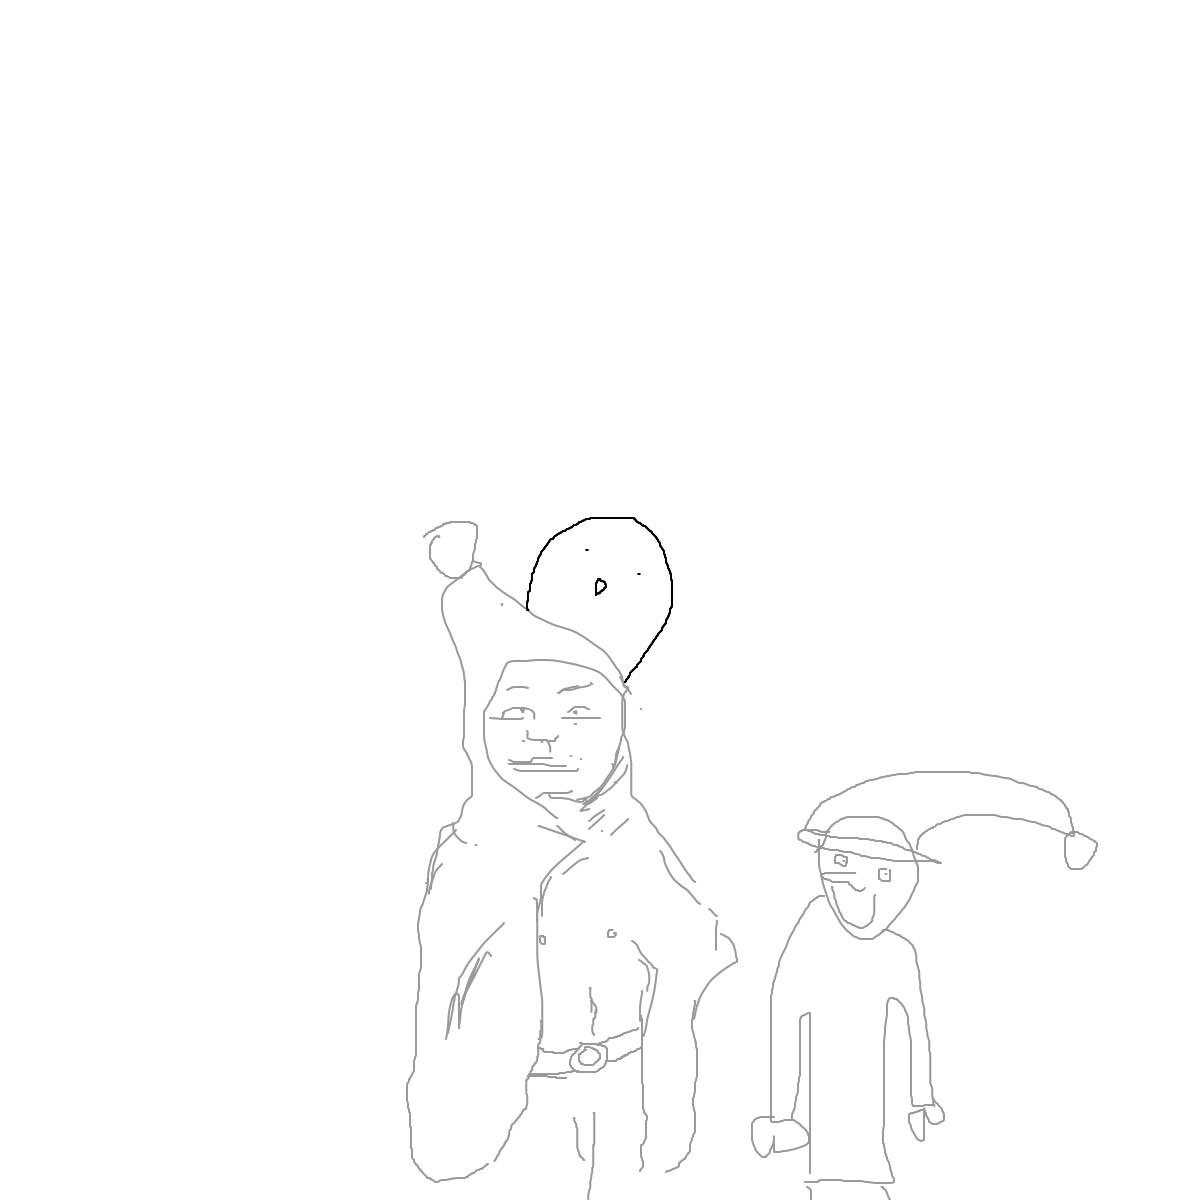 BAAAM drawing#845 lat:53.4072837829589840lng: -2.9885630607604980